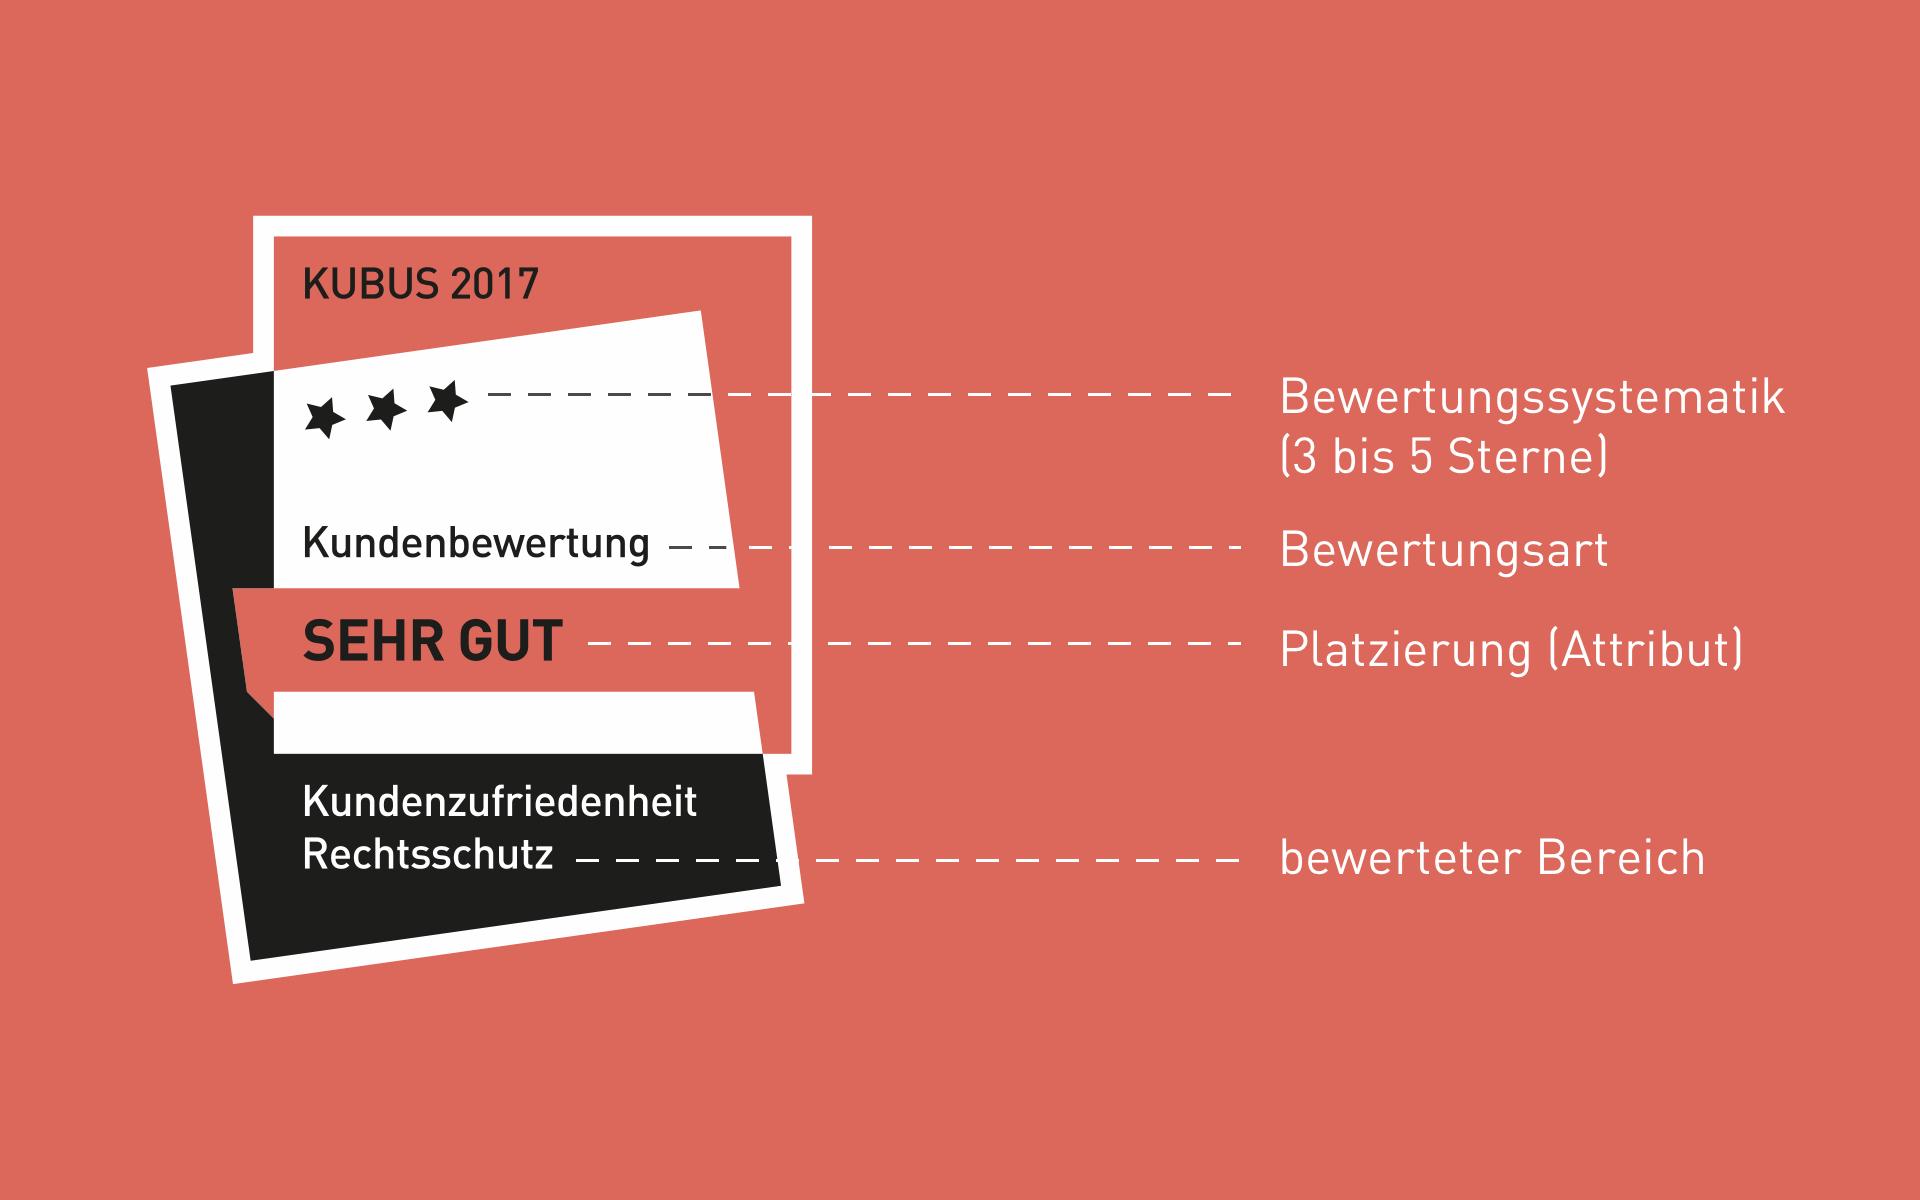 MSR Consulting Group GmbH, Gütesiegel Redesign, Aufbau